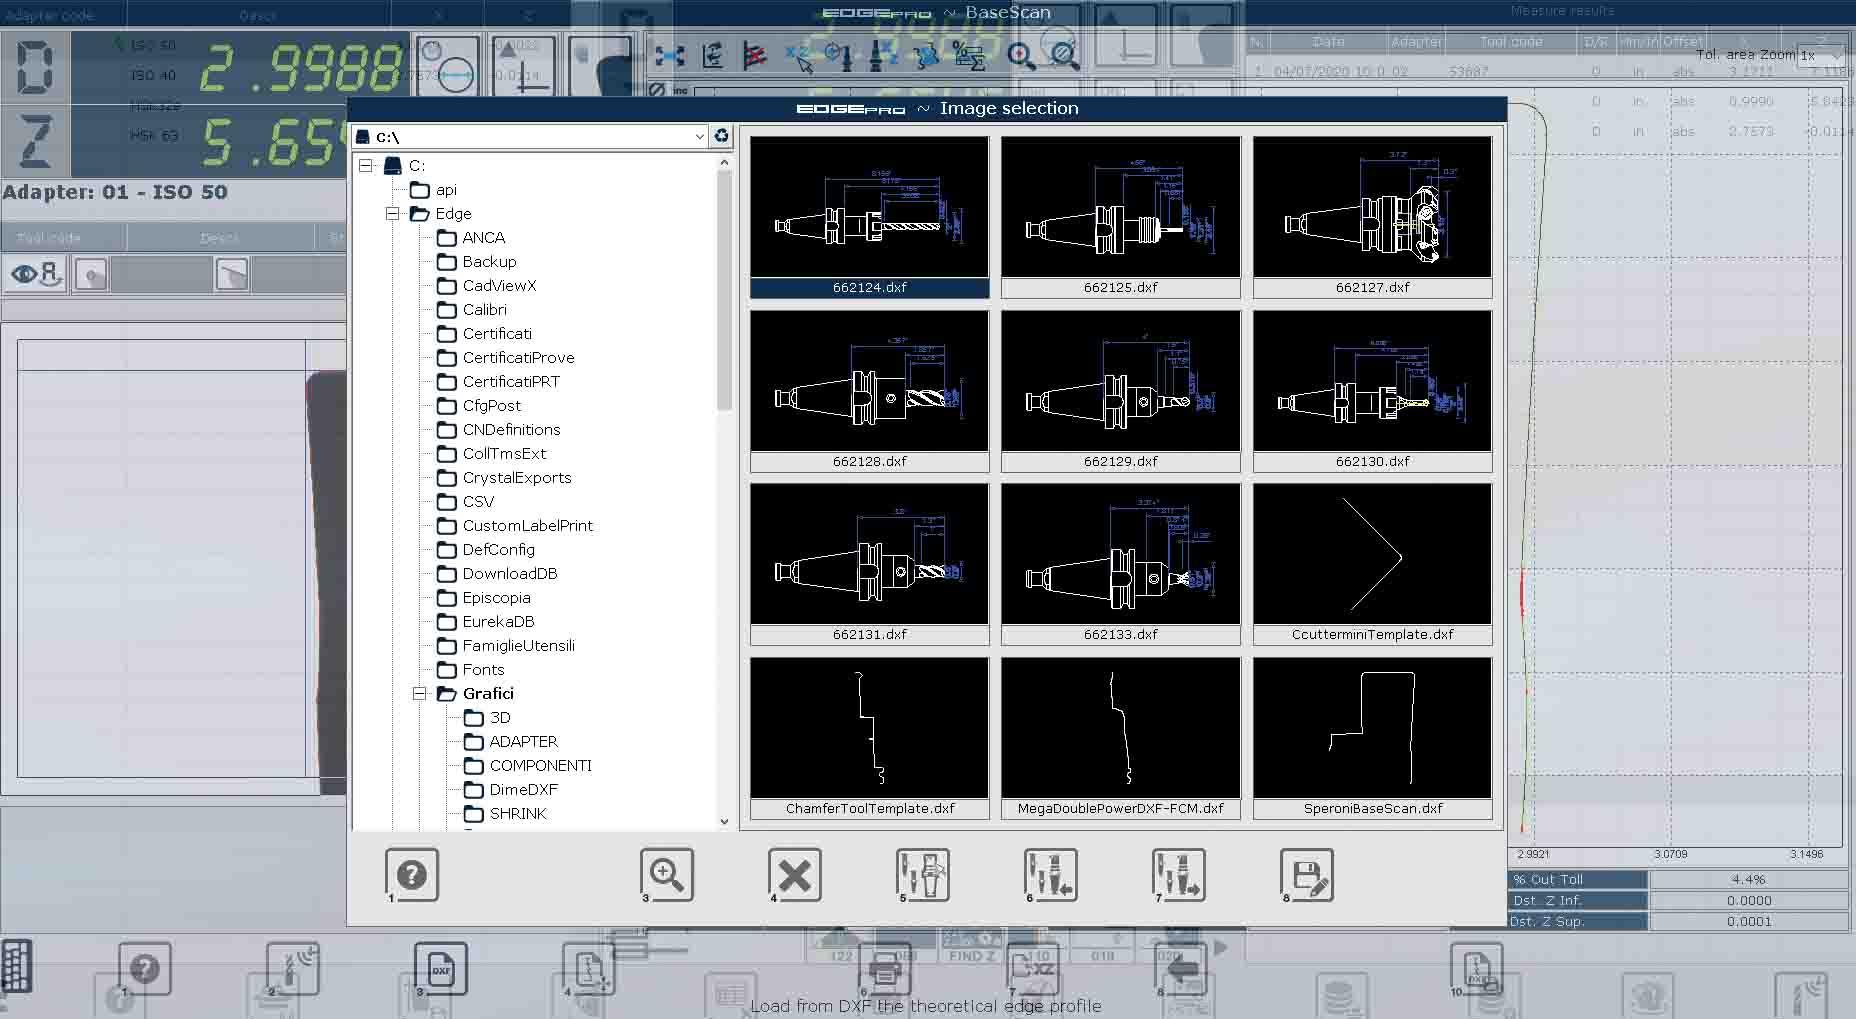 Edge Pro Base Scan screen capture.